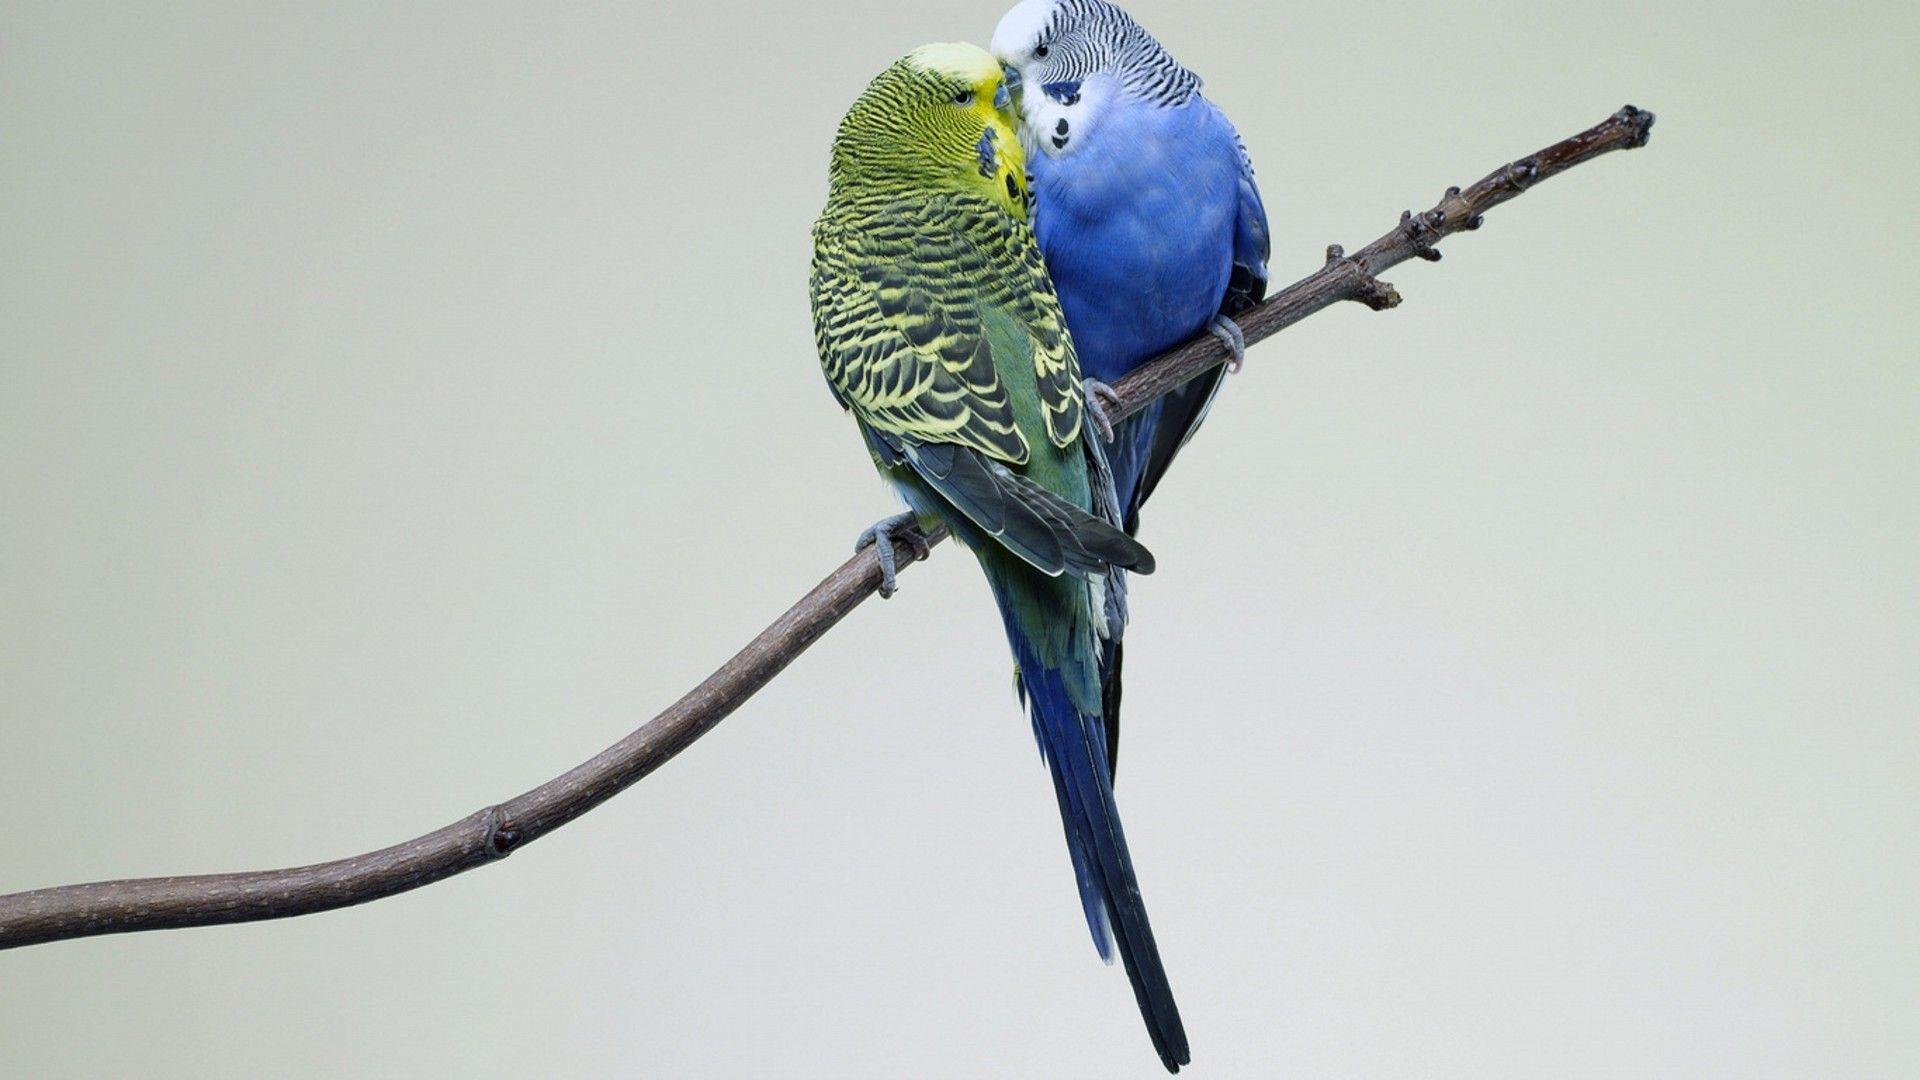 love birds hd images 9 lovebirdshdimages lovebirds birds